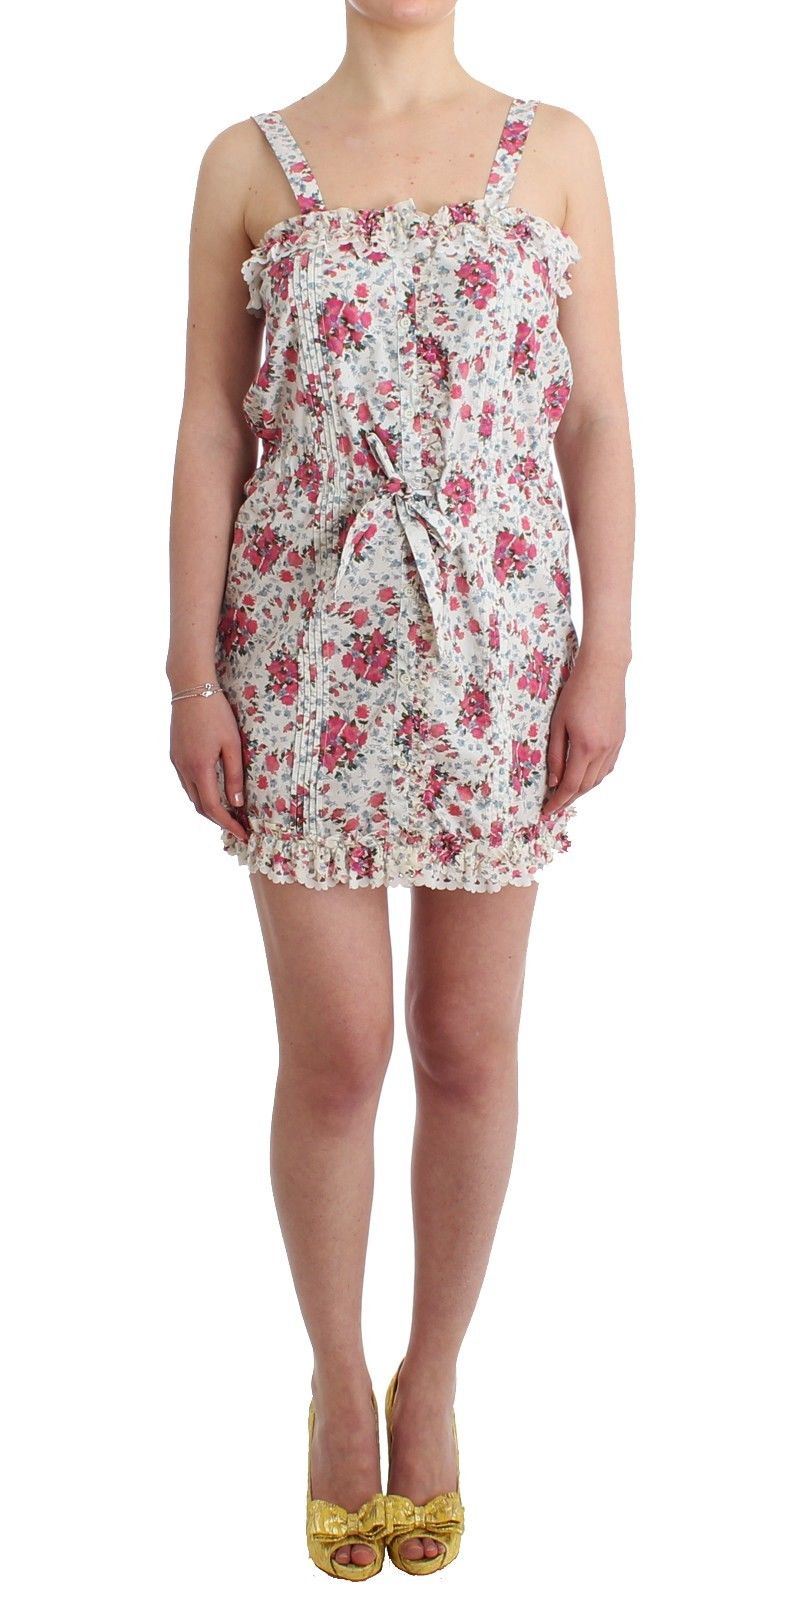 Ermanno Scervino Women's Mini Dress Pink Floral SIG11510 - IT48